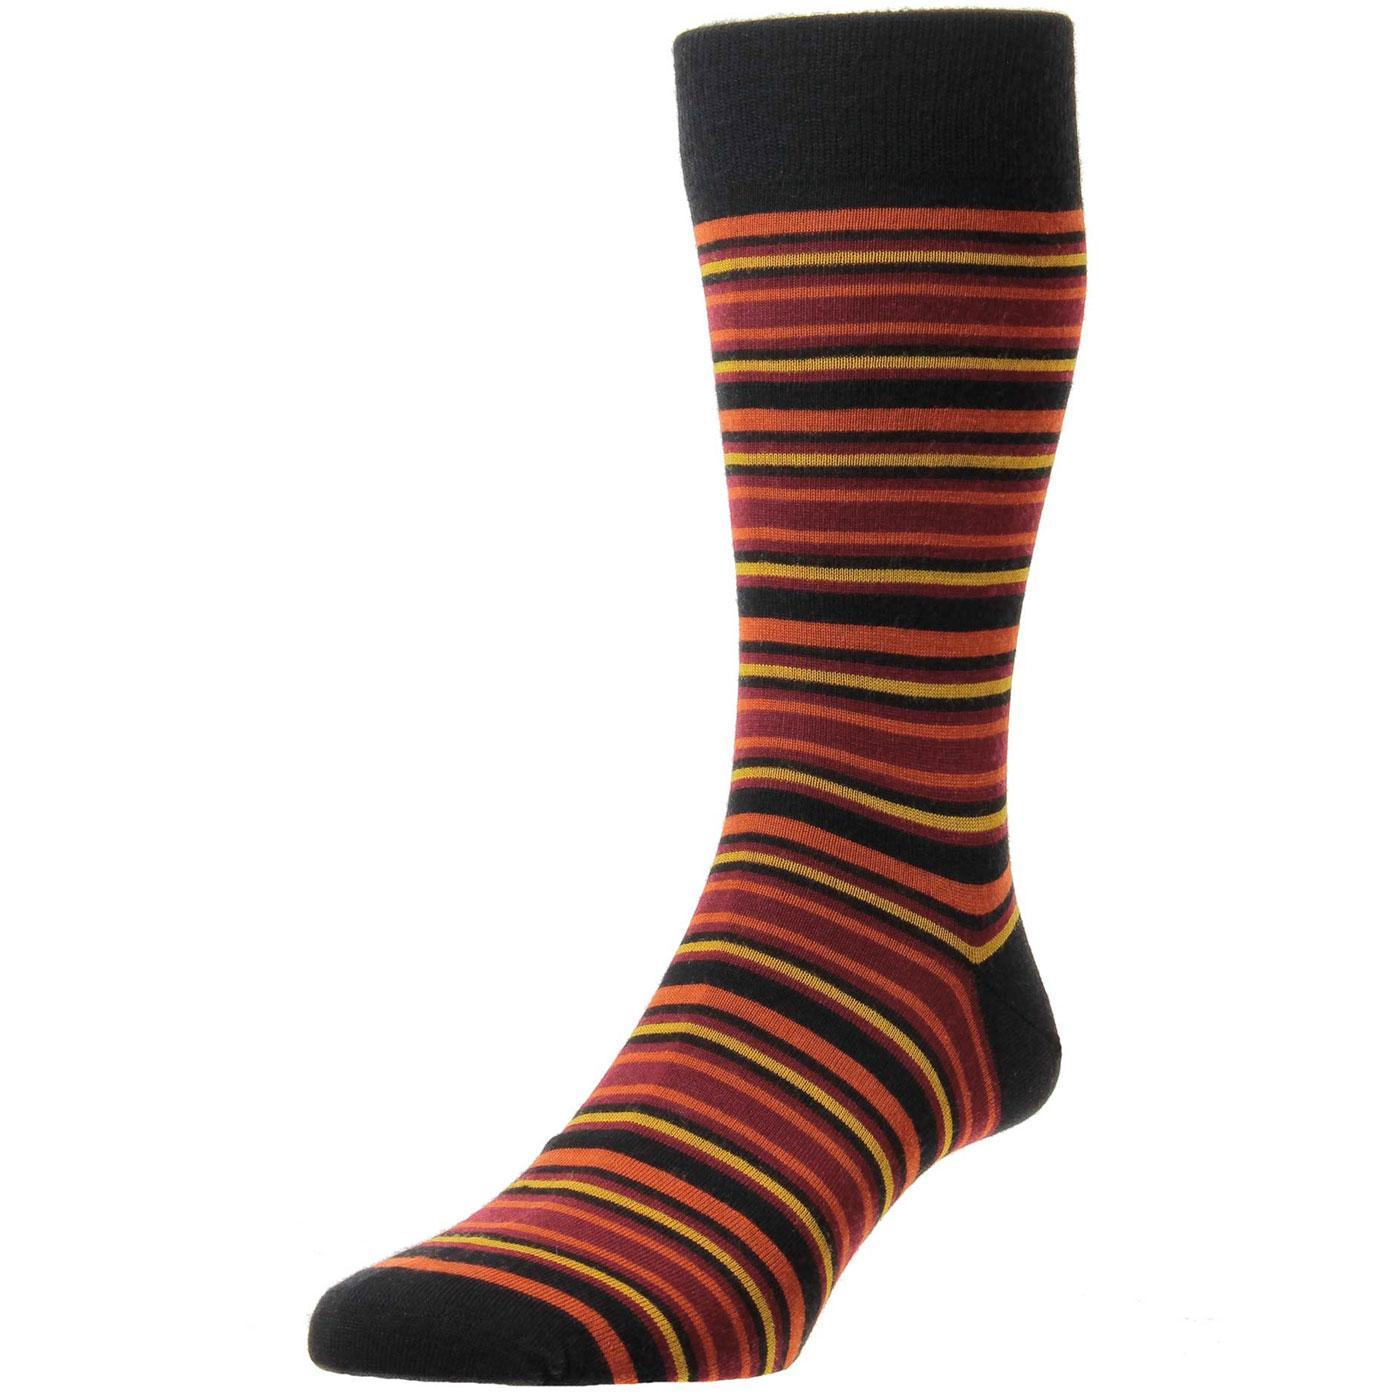 + Piper PANTHERELLA Men's Mod Striped Socks B